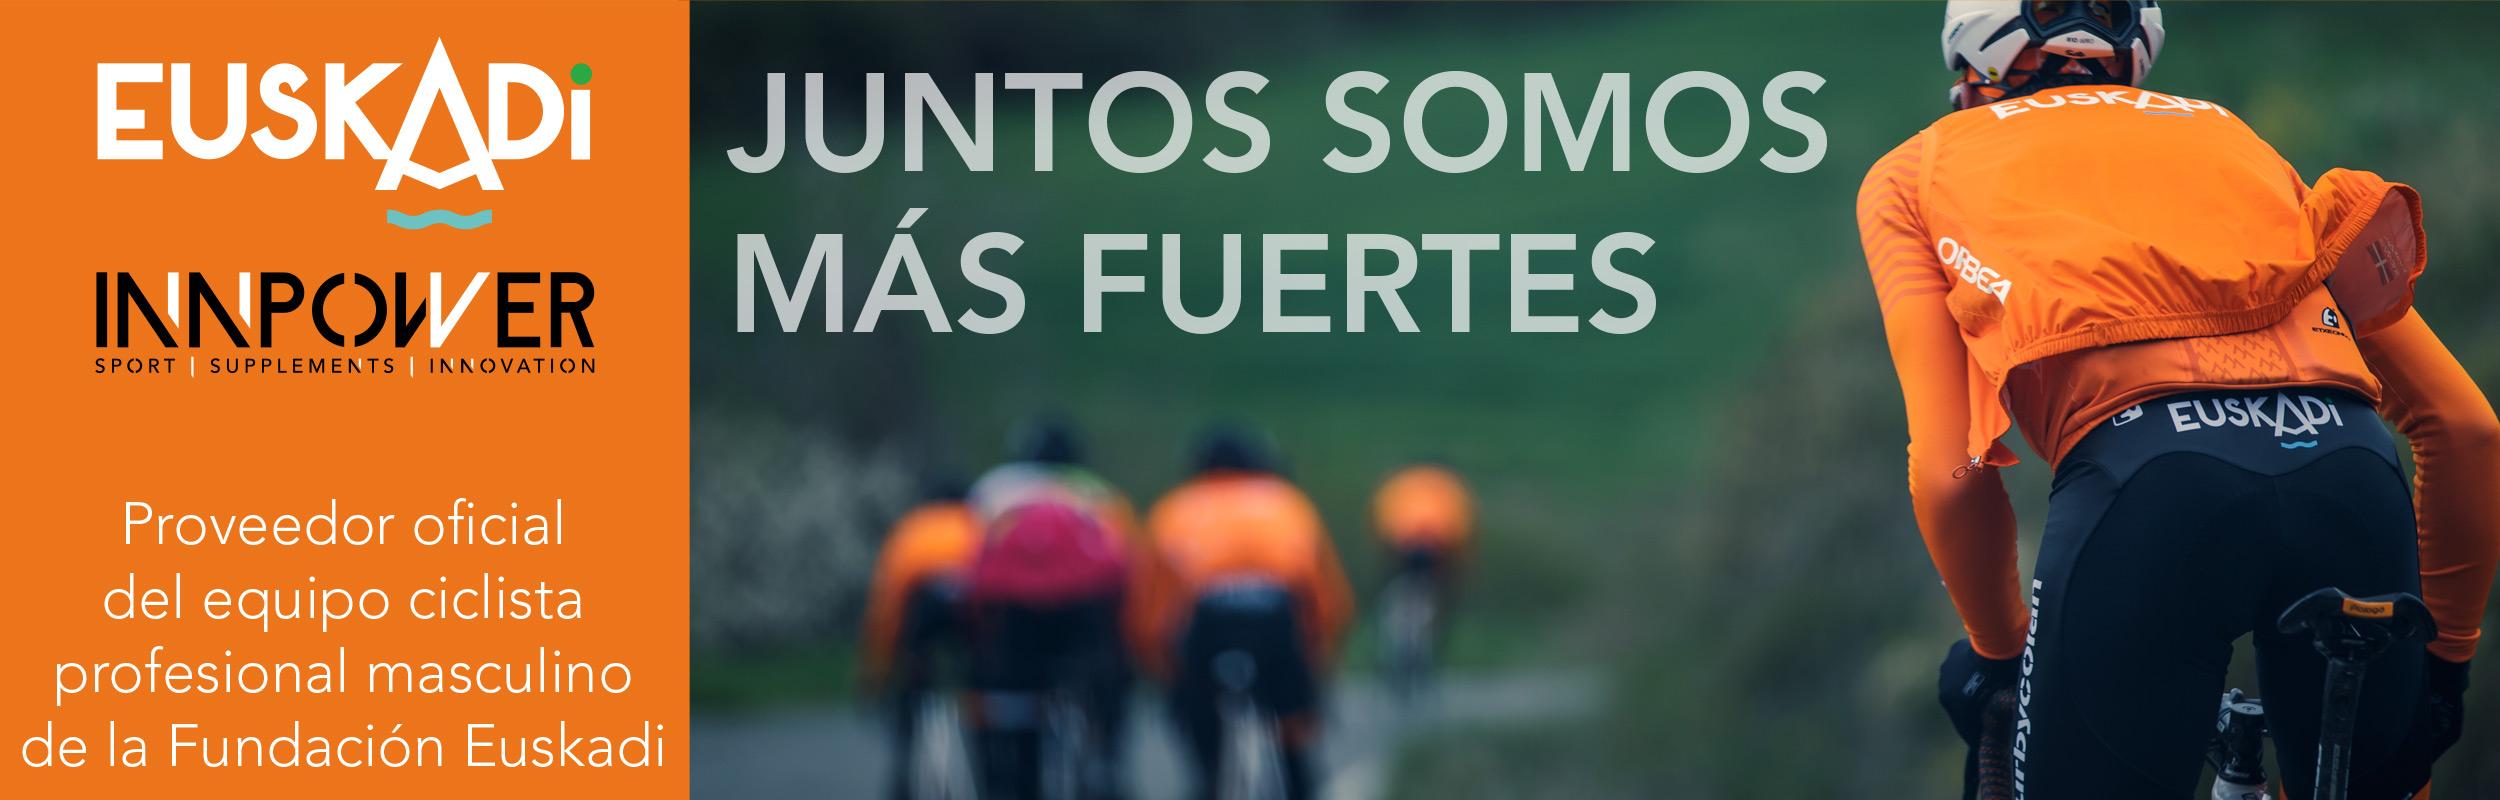 Innpower Proveedor oficial del equipo ciclista profesional masculino de la Fundación Euskadi